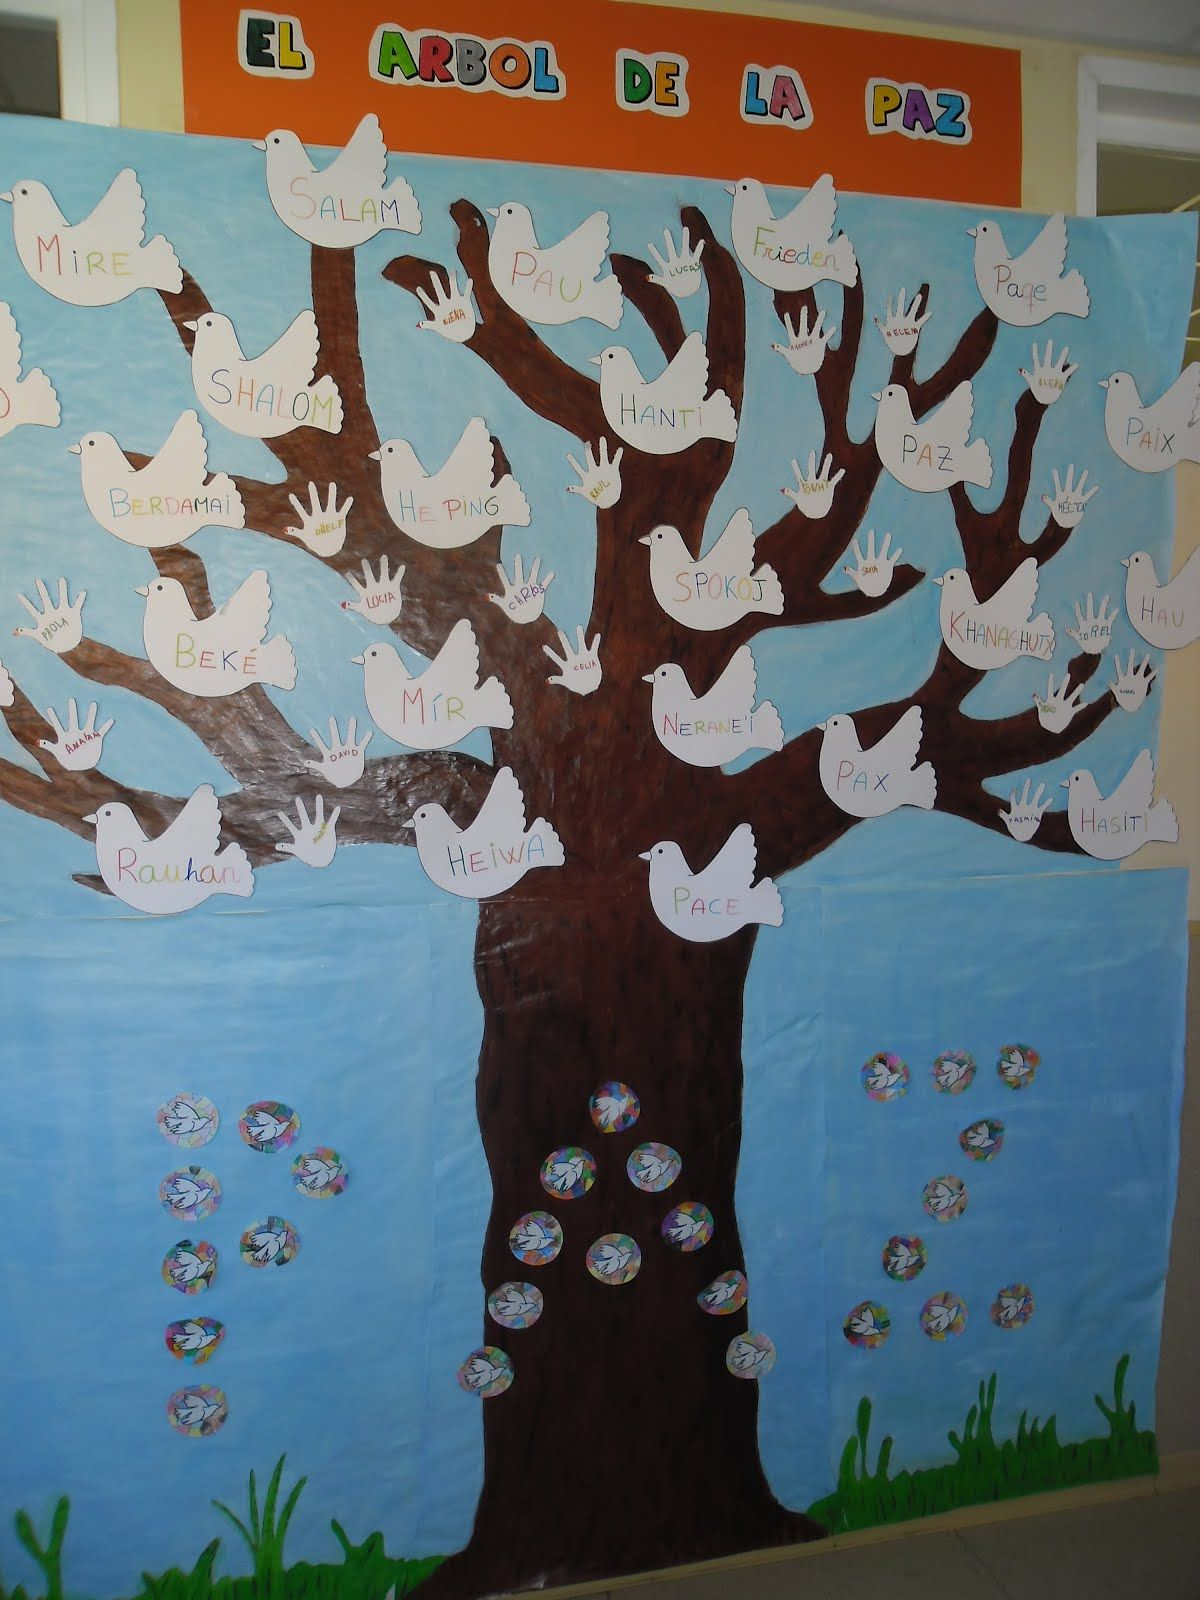 21 Ideas De Día De La Paz Dia De La Paz Paz Mural De La Paz